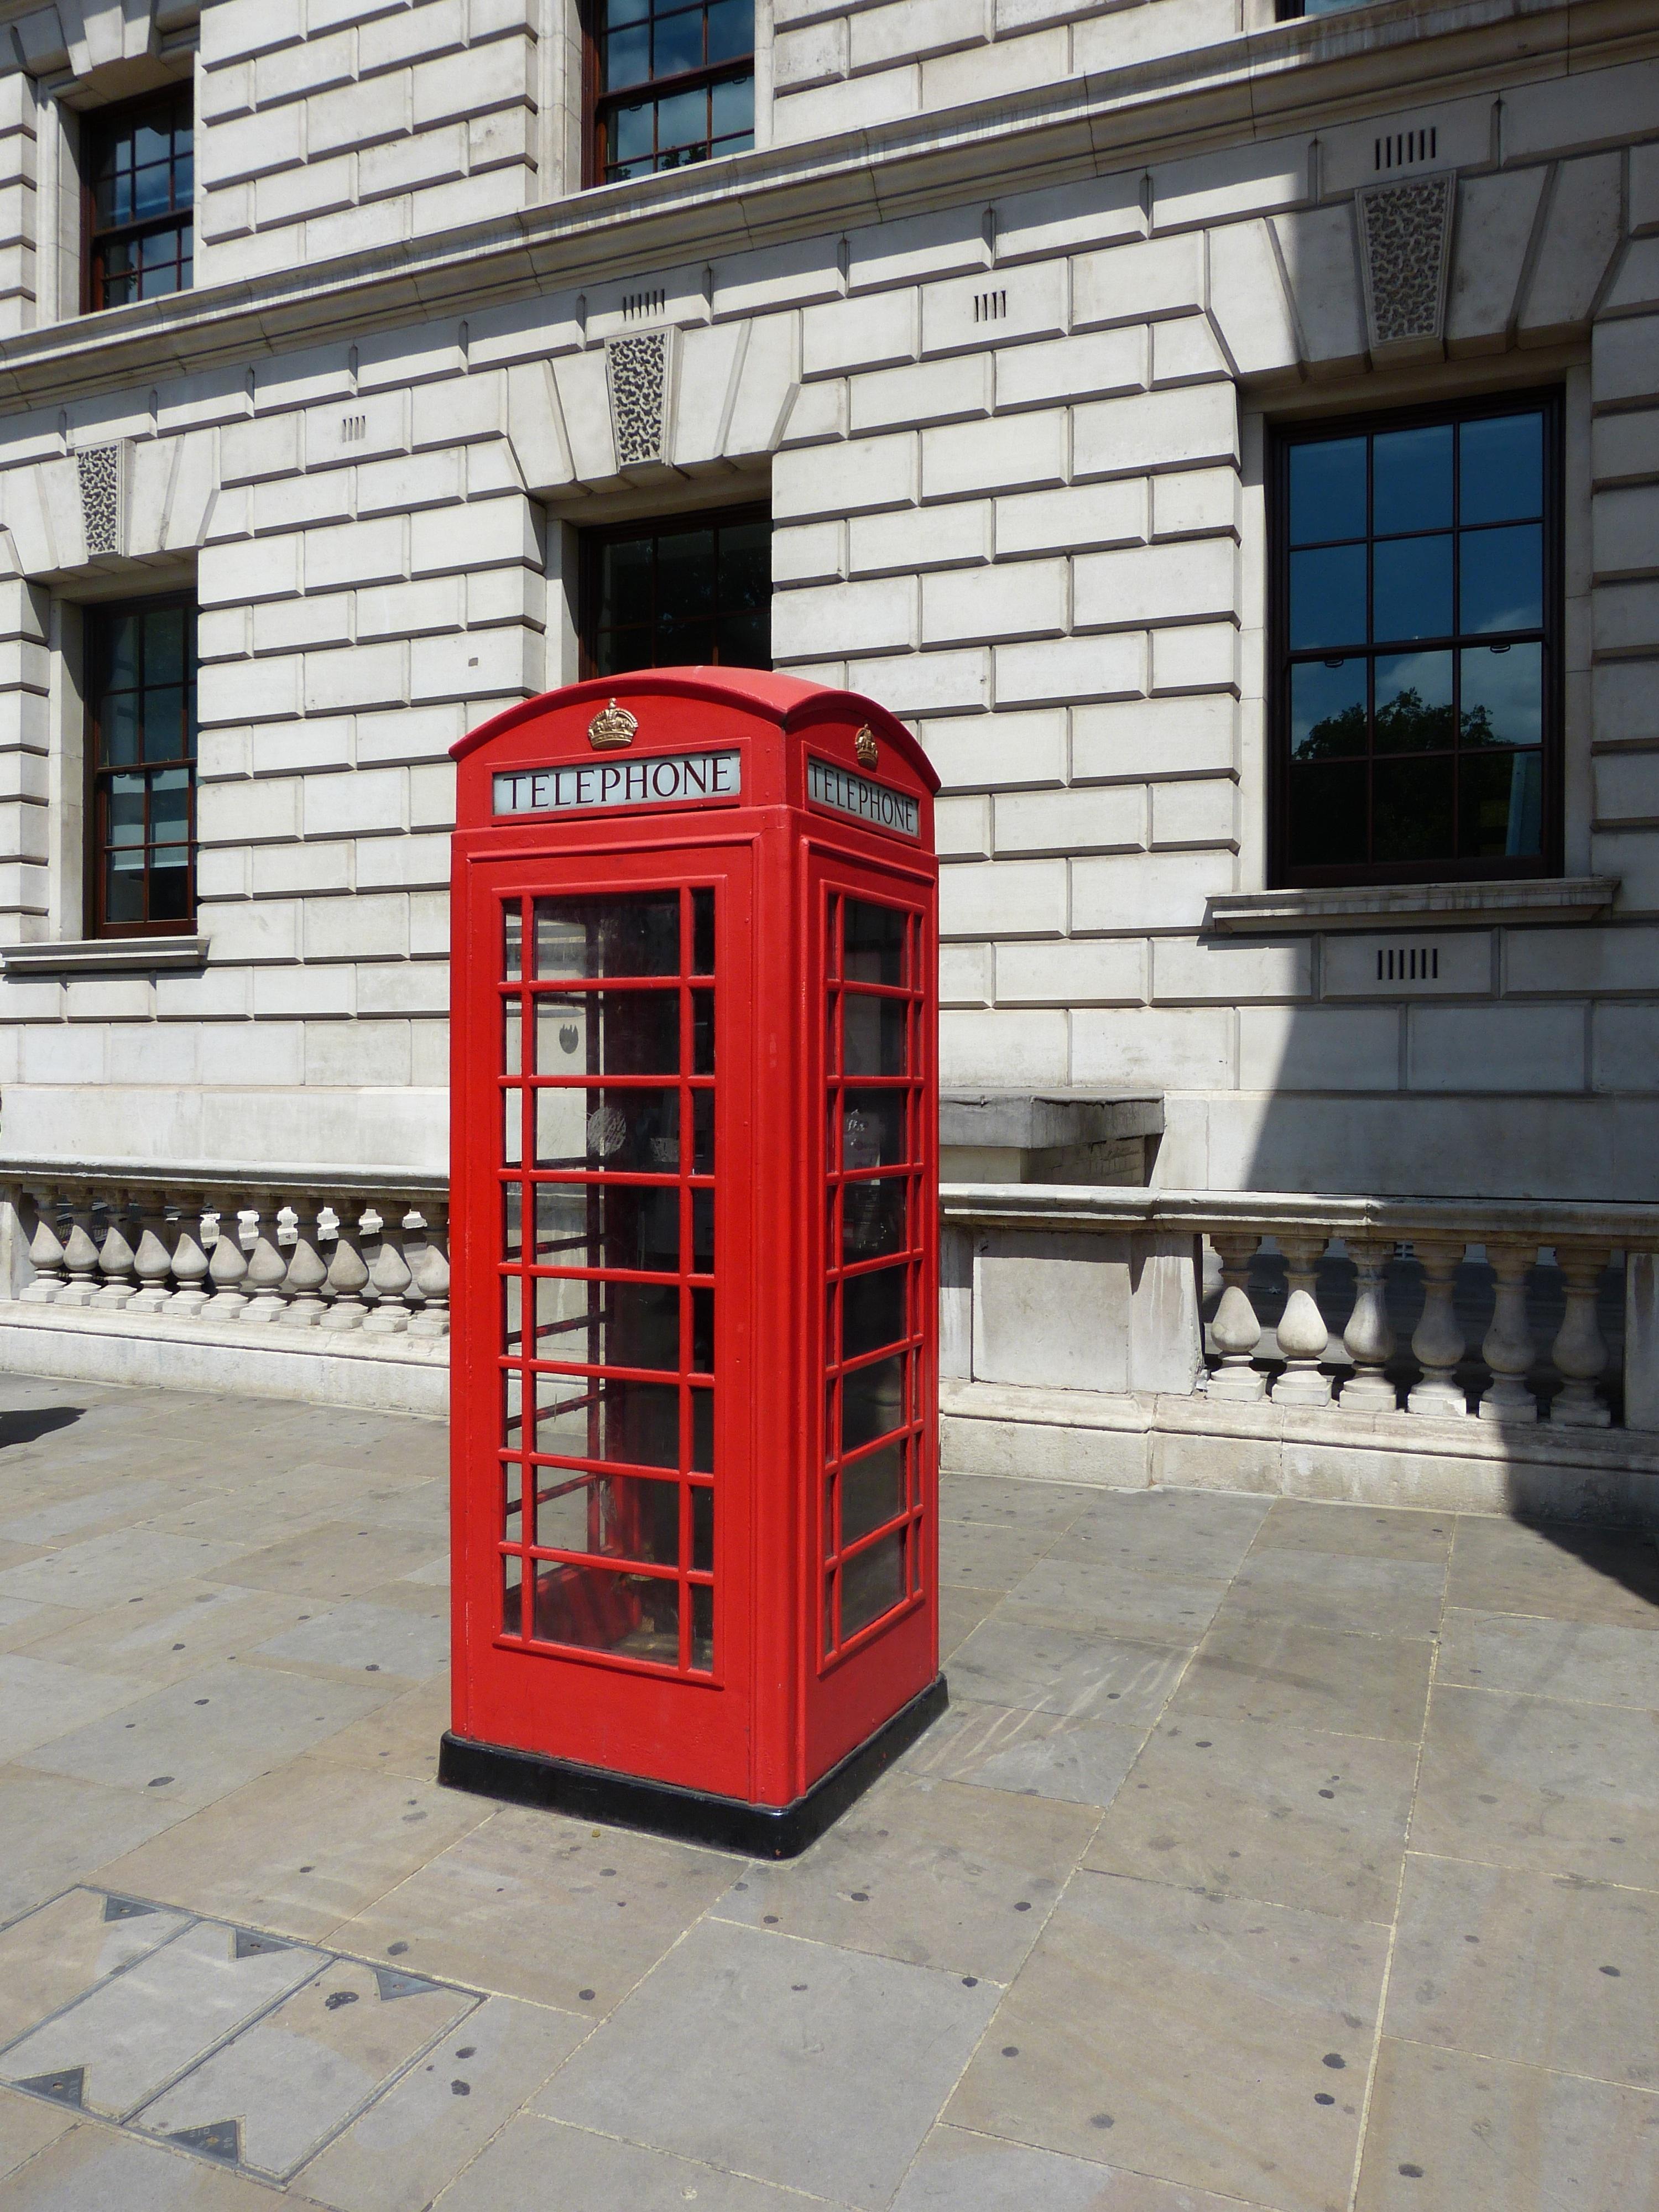 Images Gratuites Telephone Porte Londres Telephone Public